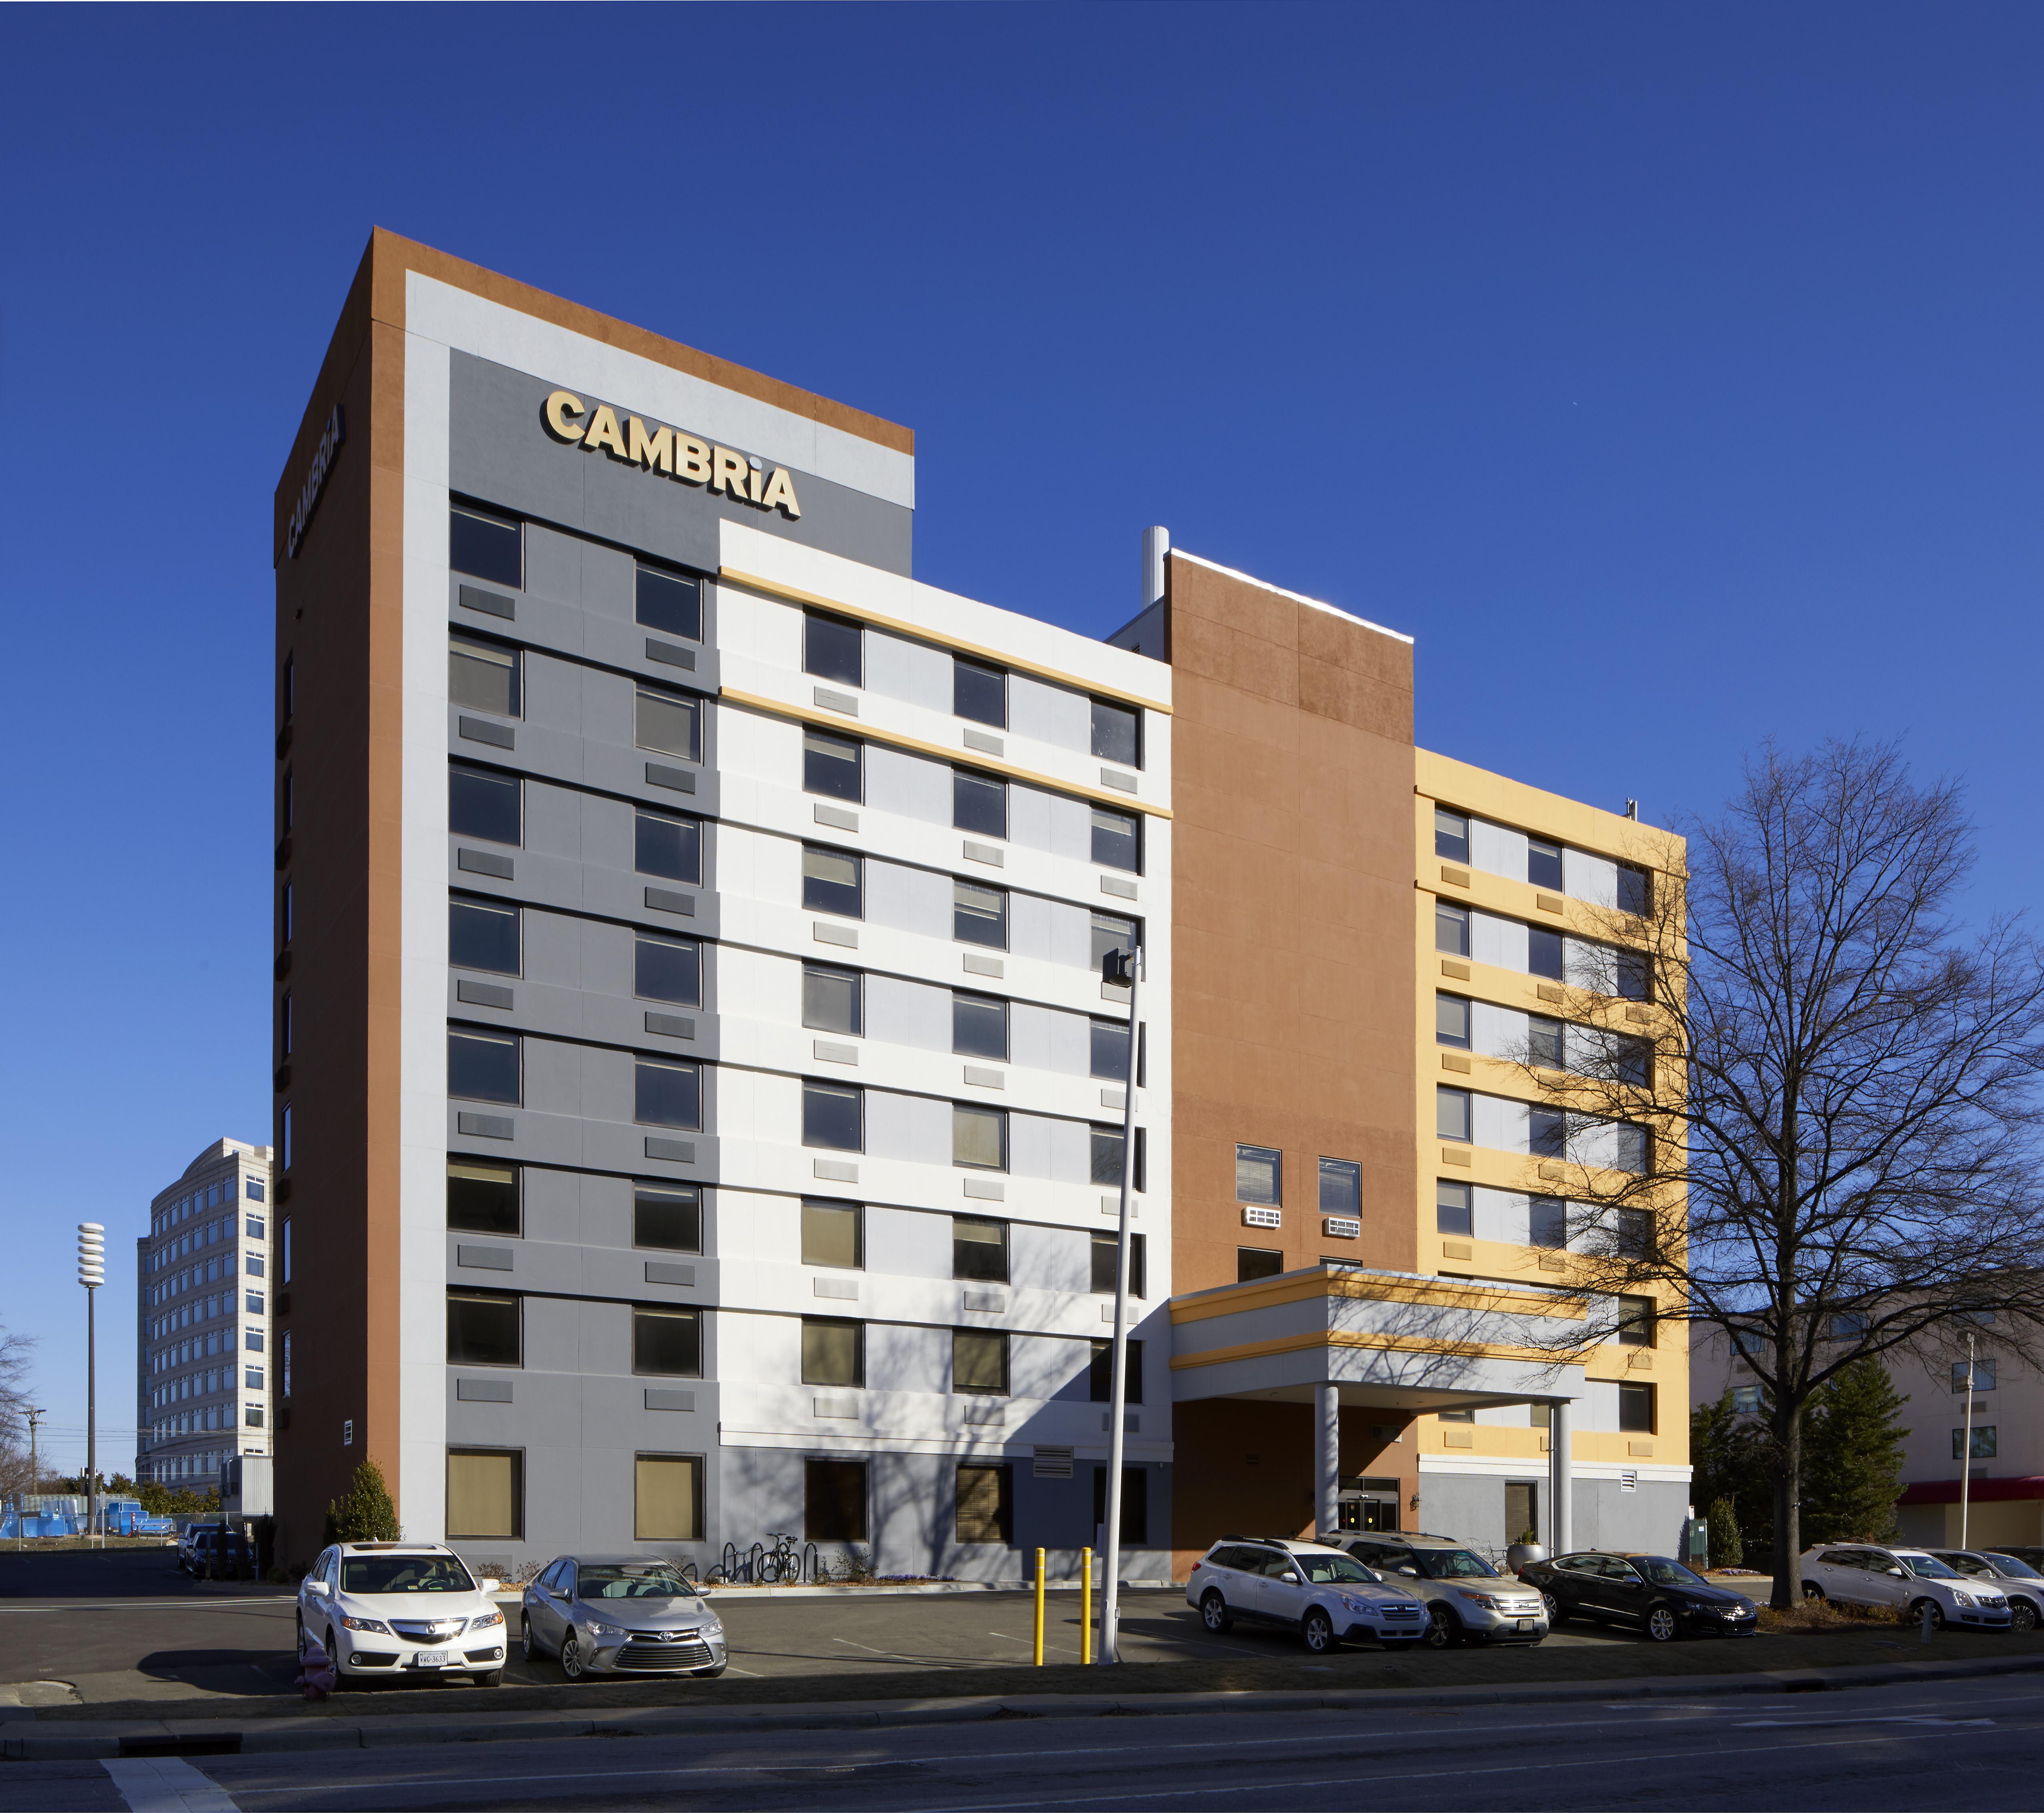 cambria hotel suites durham near duke university. Black Bedroom Furniture Sets. Home Design Ideas